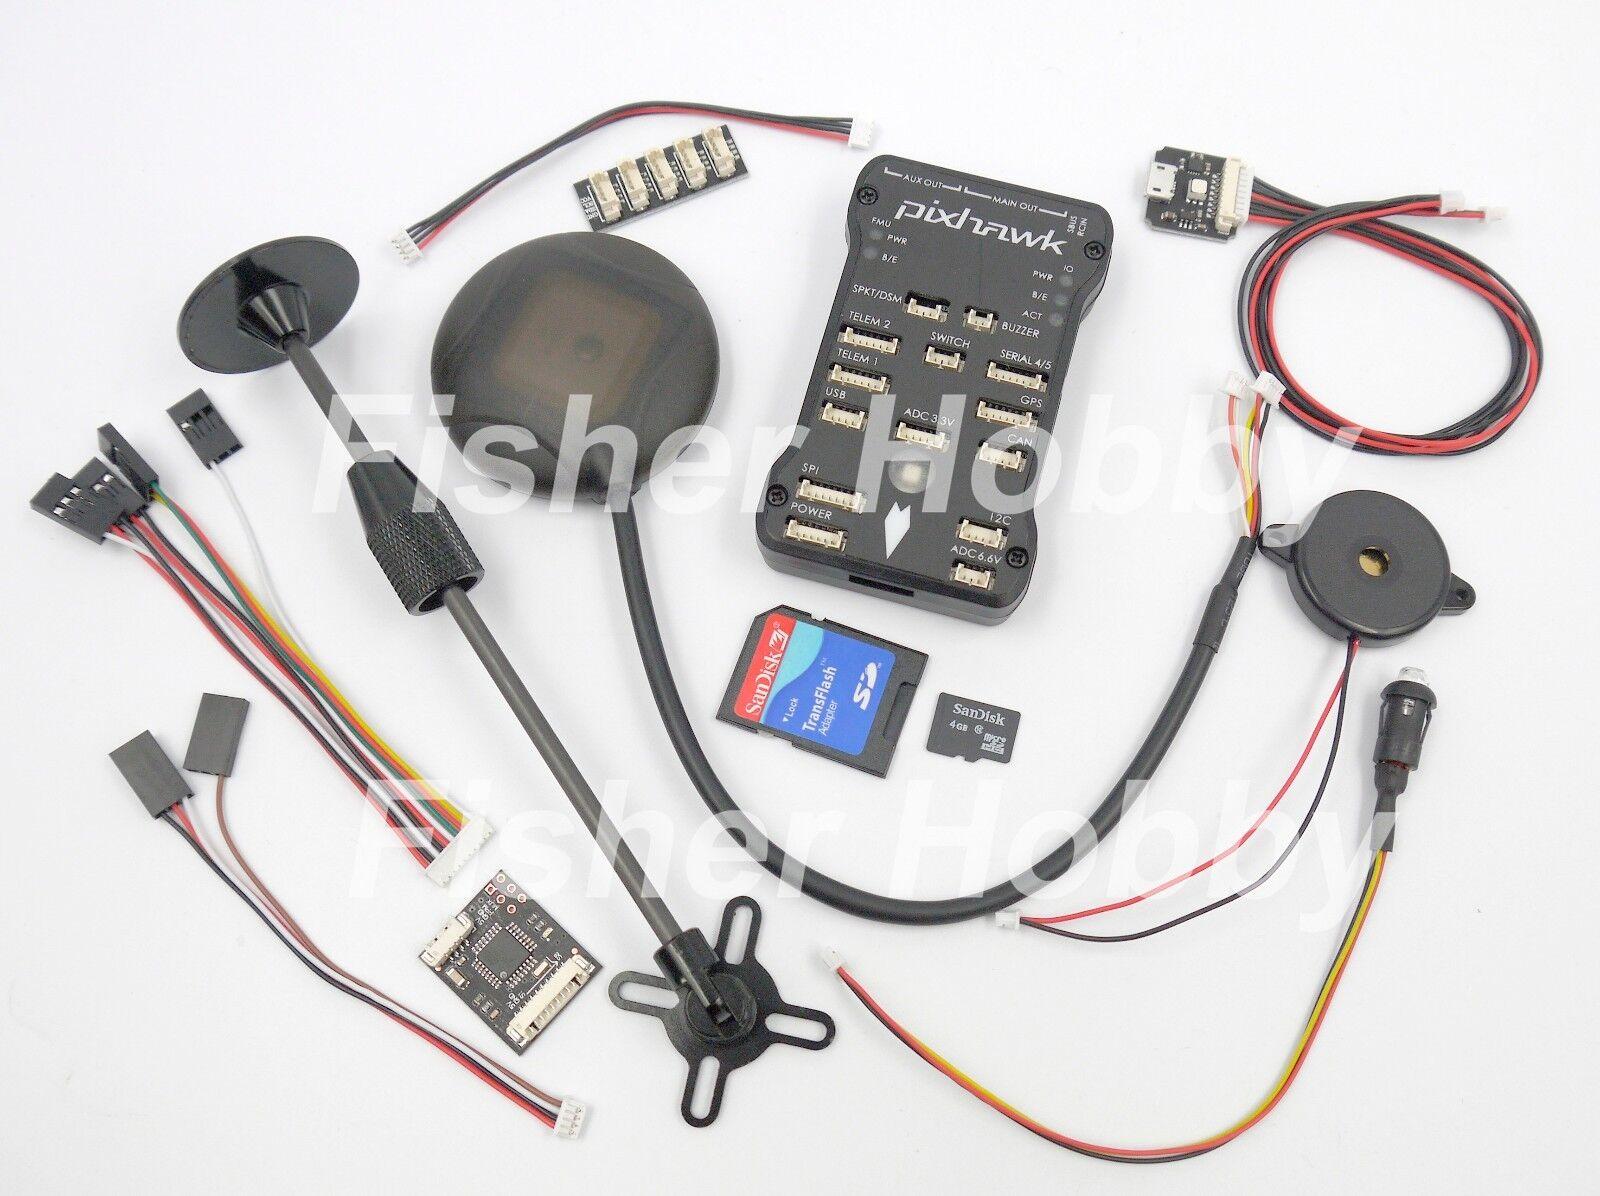 Pixhawk Px4 2.4.6 32 Bit Arm Flight Controller Neo-6m /7m GPS 4g TF ...